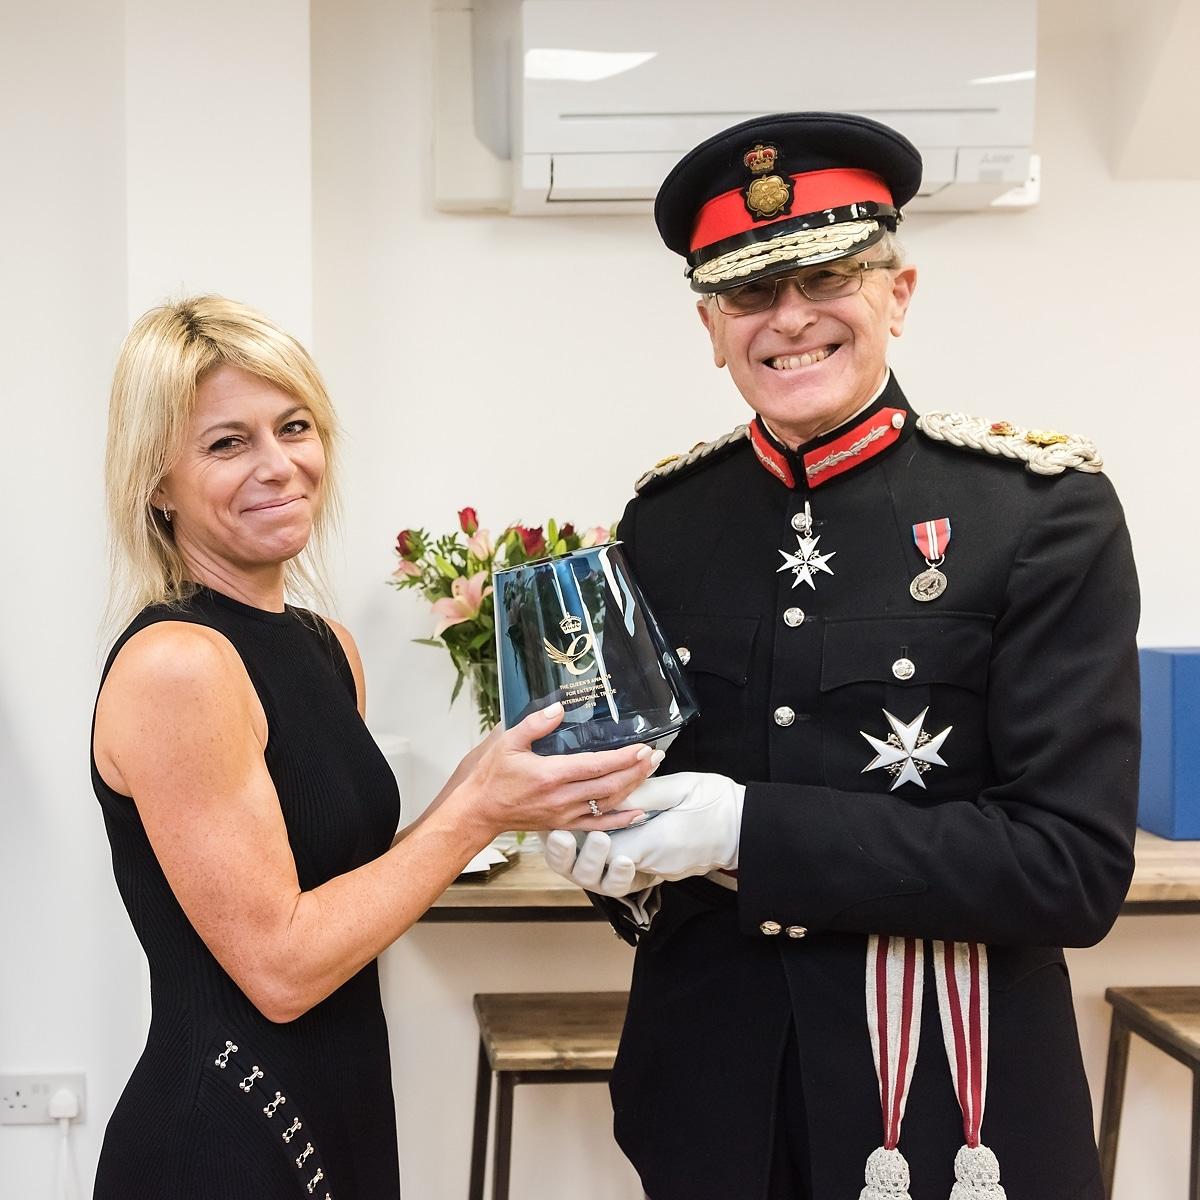 Customer Thermometer queen's award reception lindsay willott